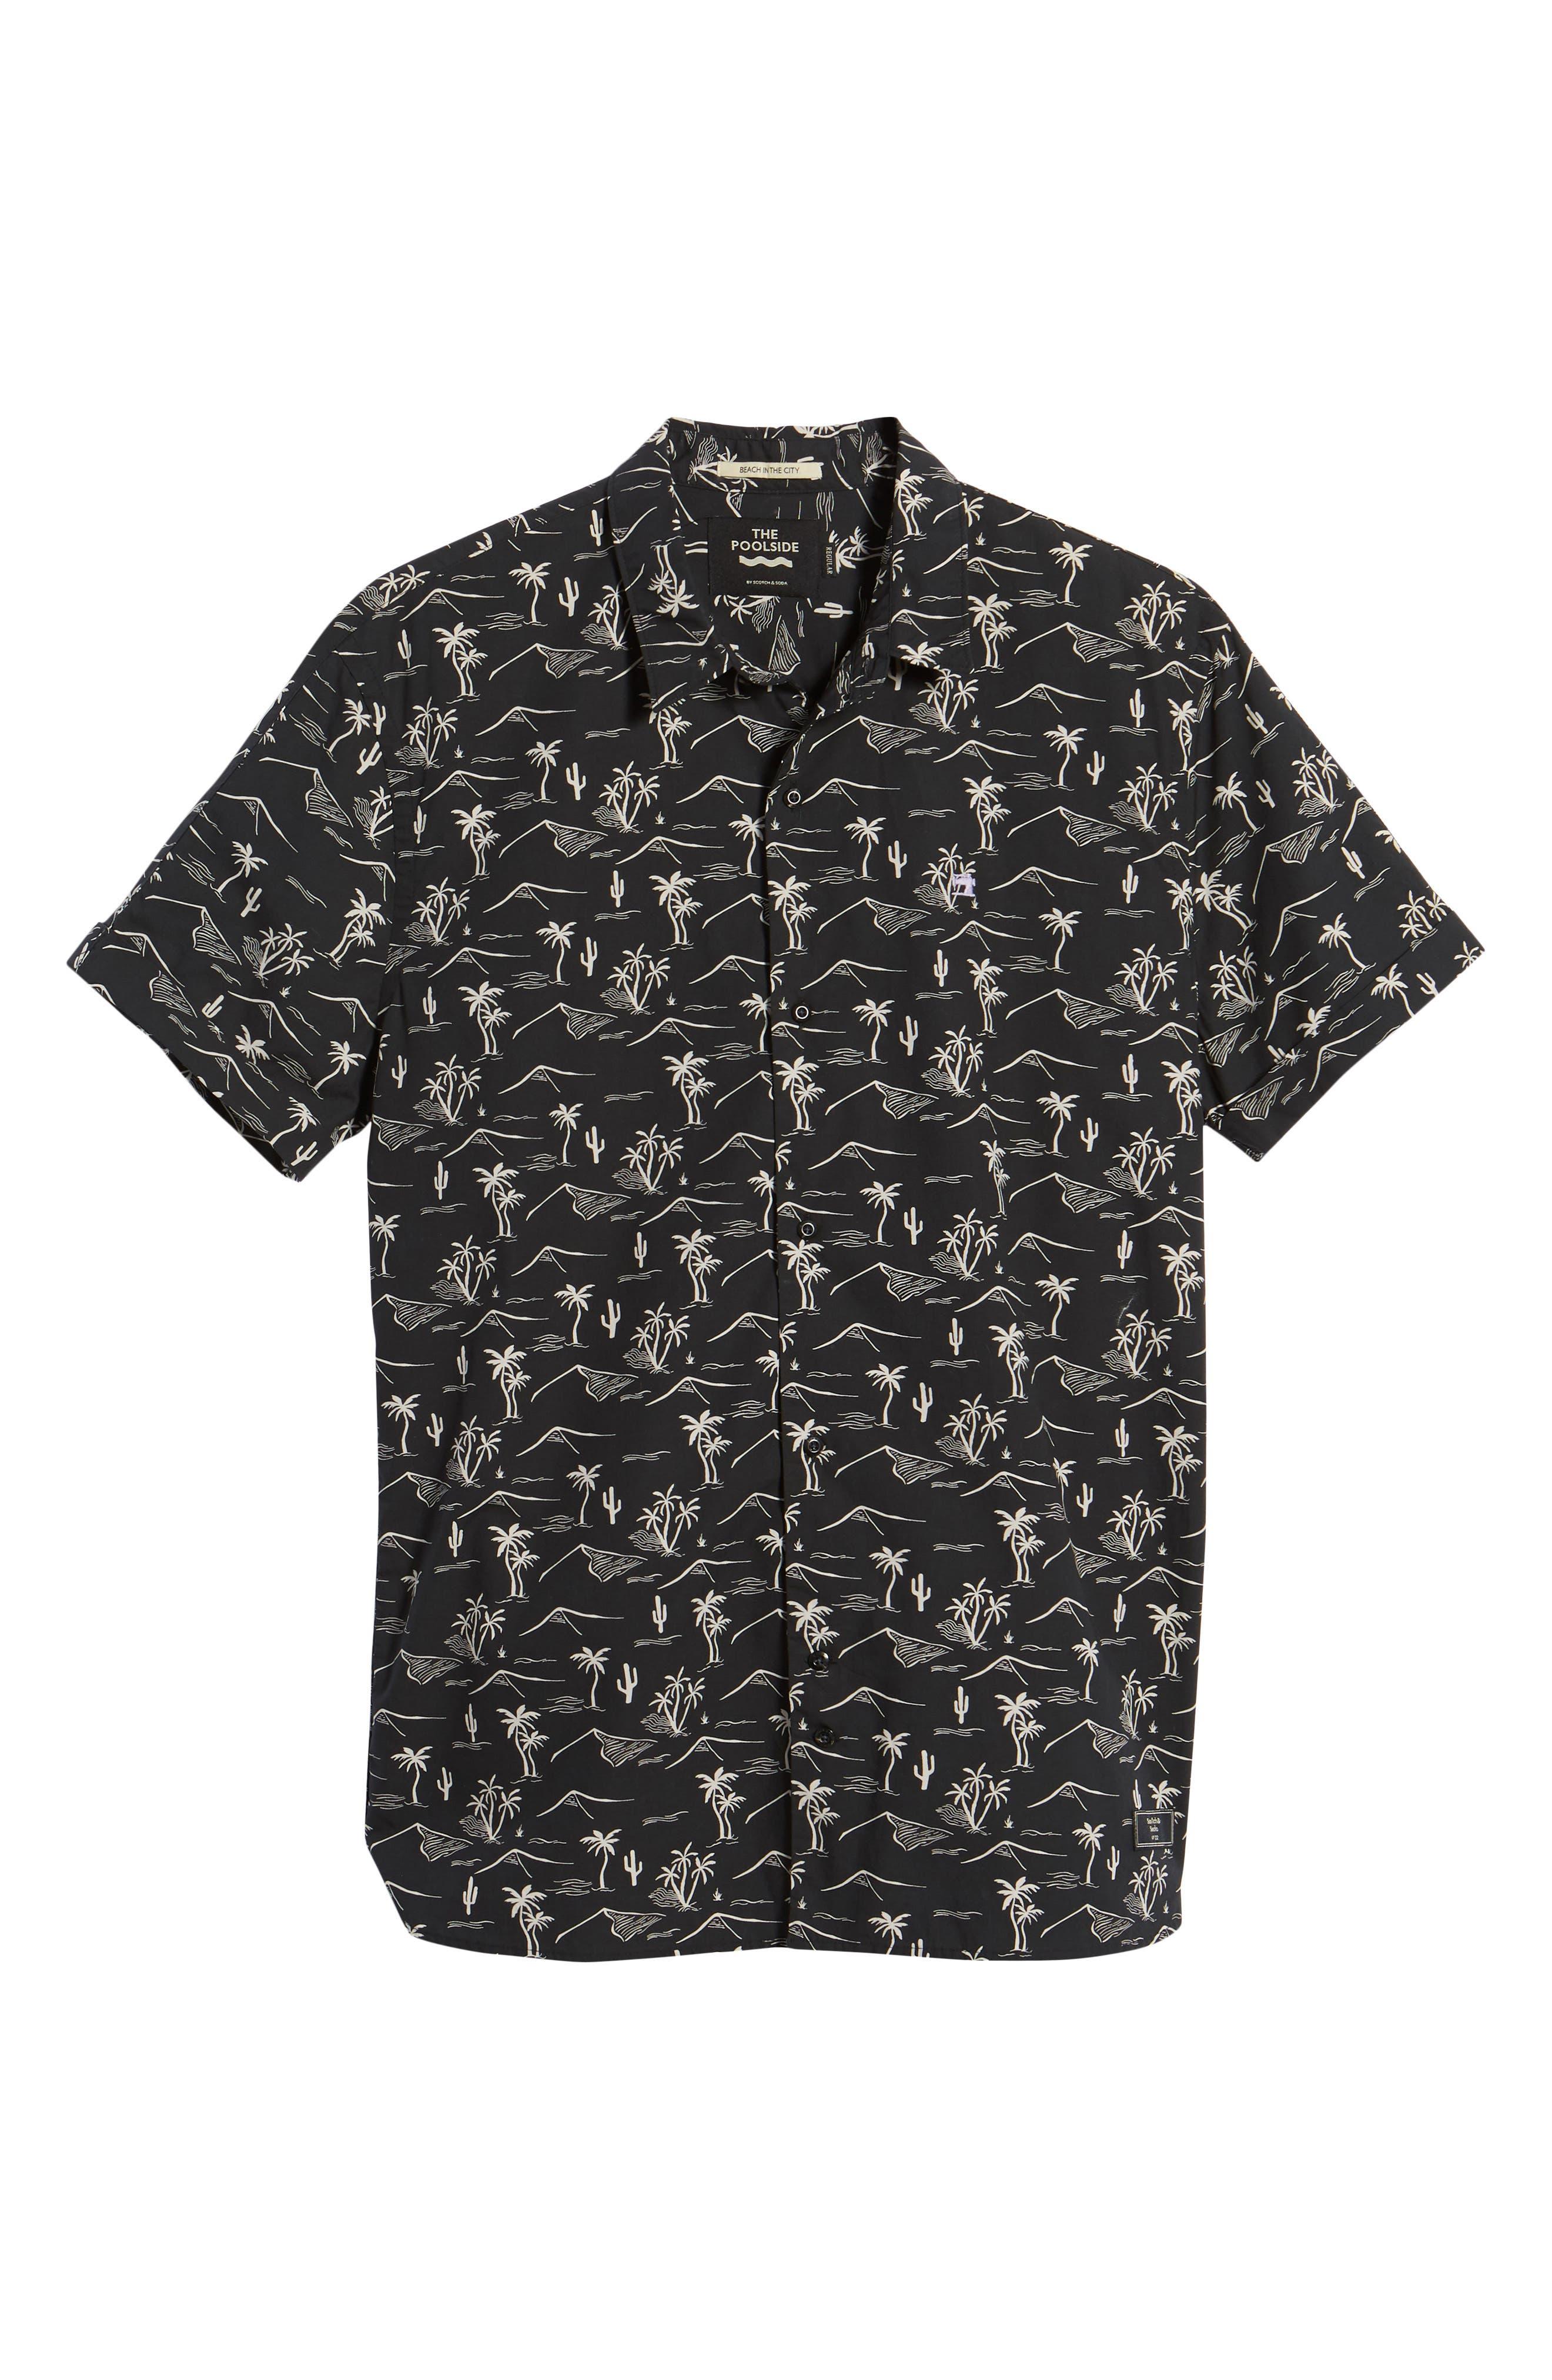 Poolside Woven Shirt,                             Alternate thumbnail 6, color,                             COMBO C